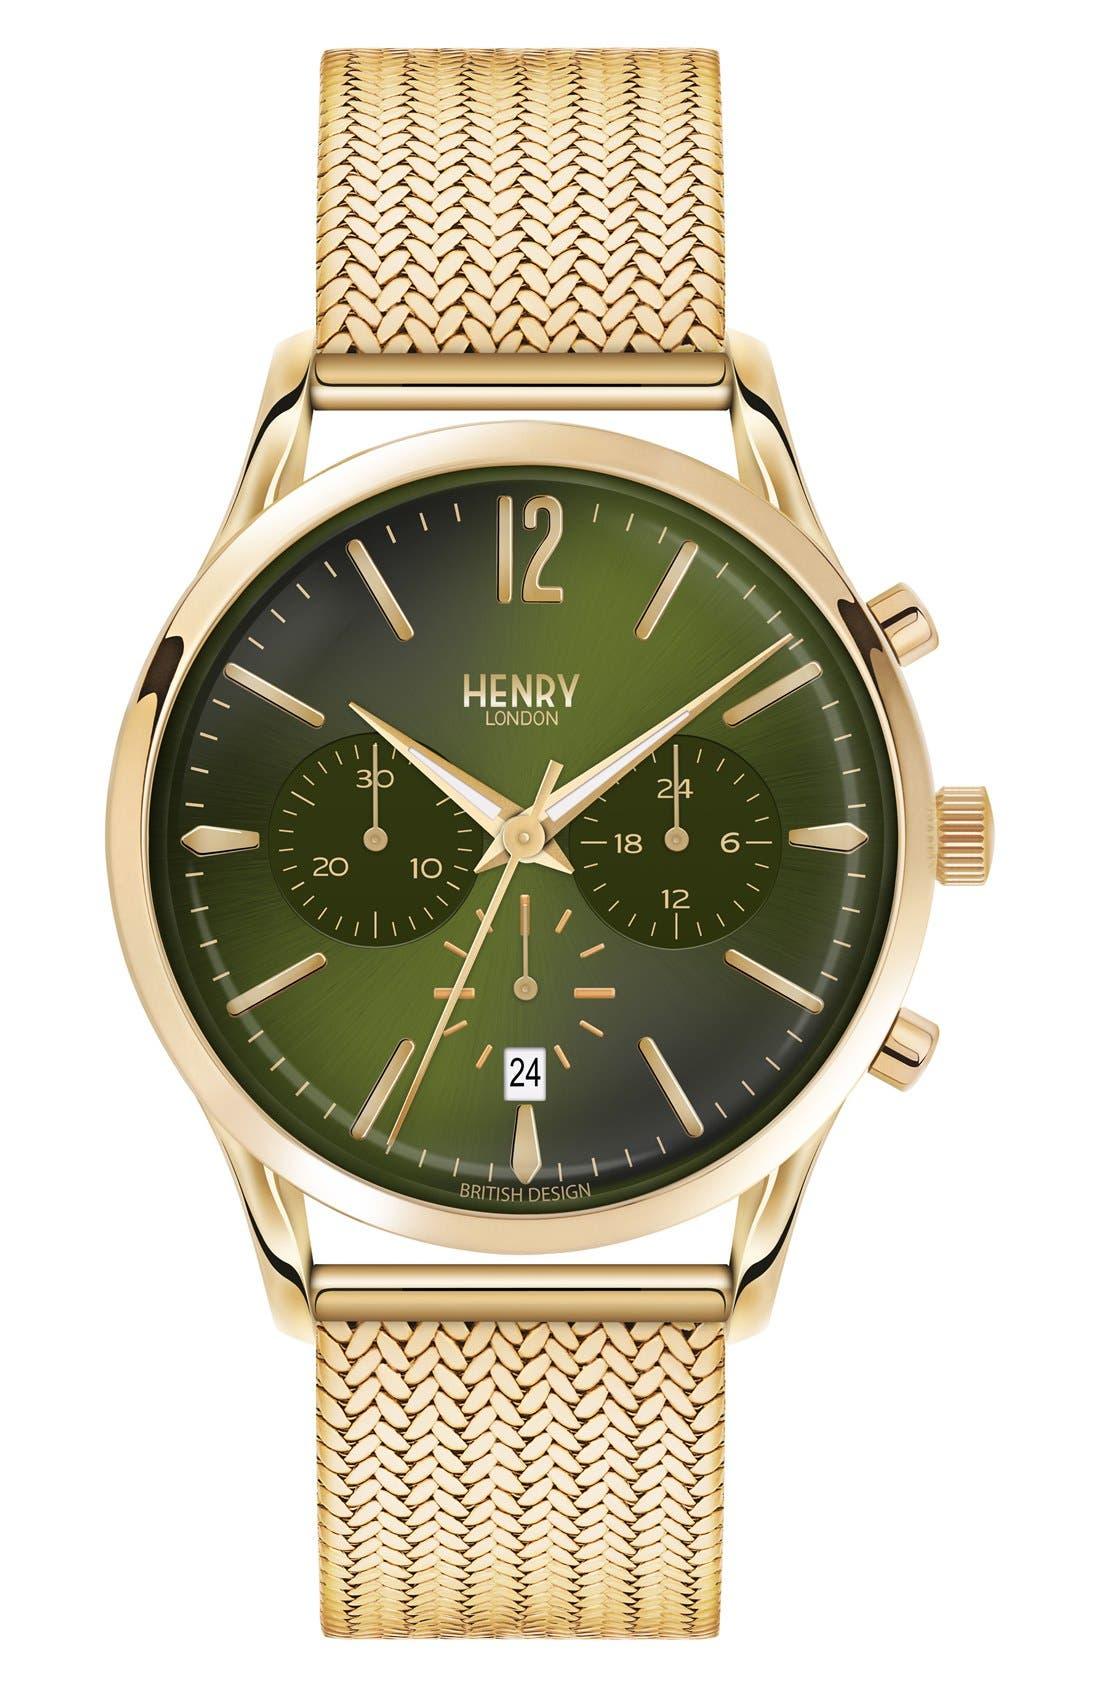 Main Image - Henry London Chiswick Chronograph Mesh Strap Watch, 41mm